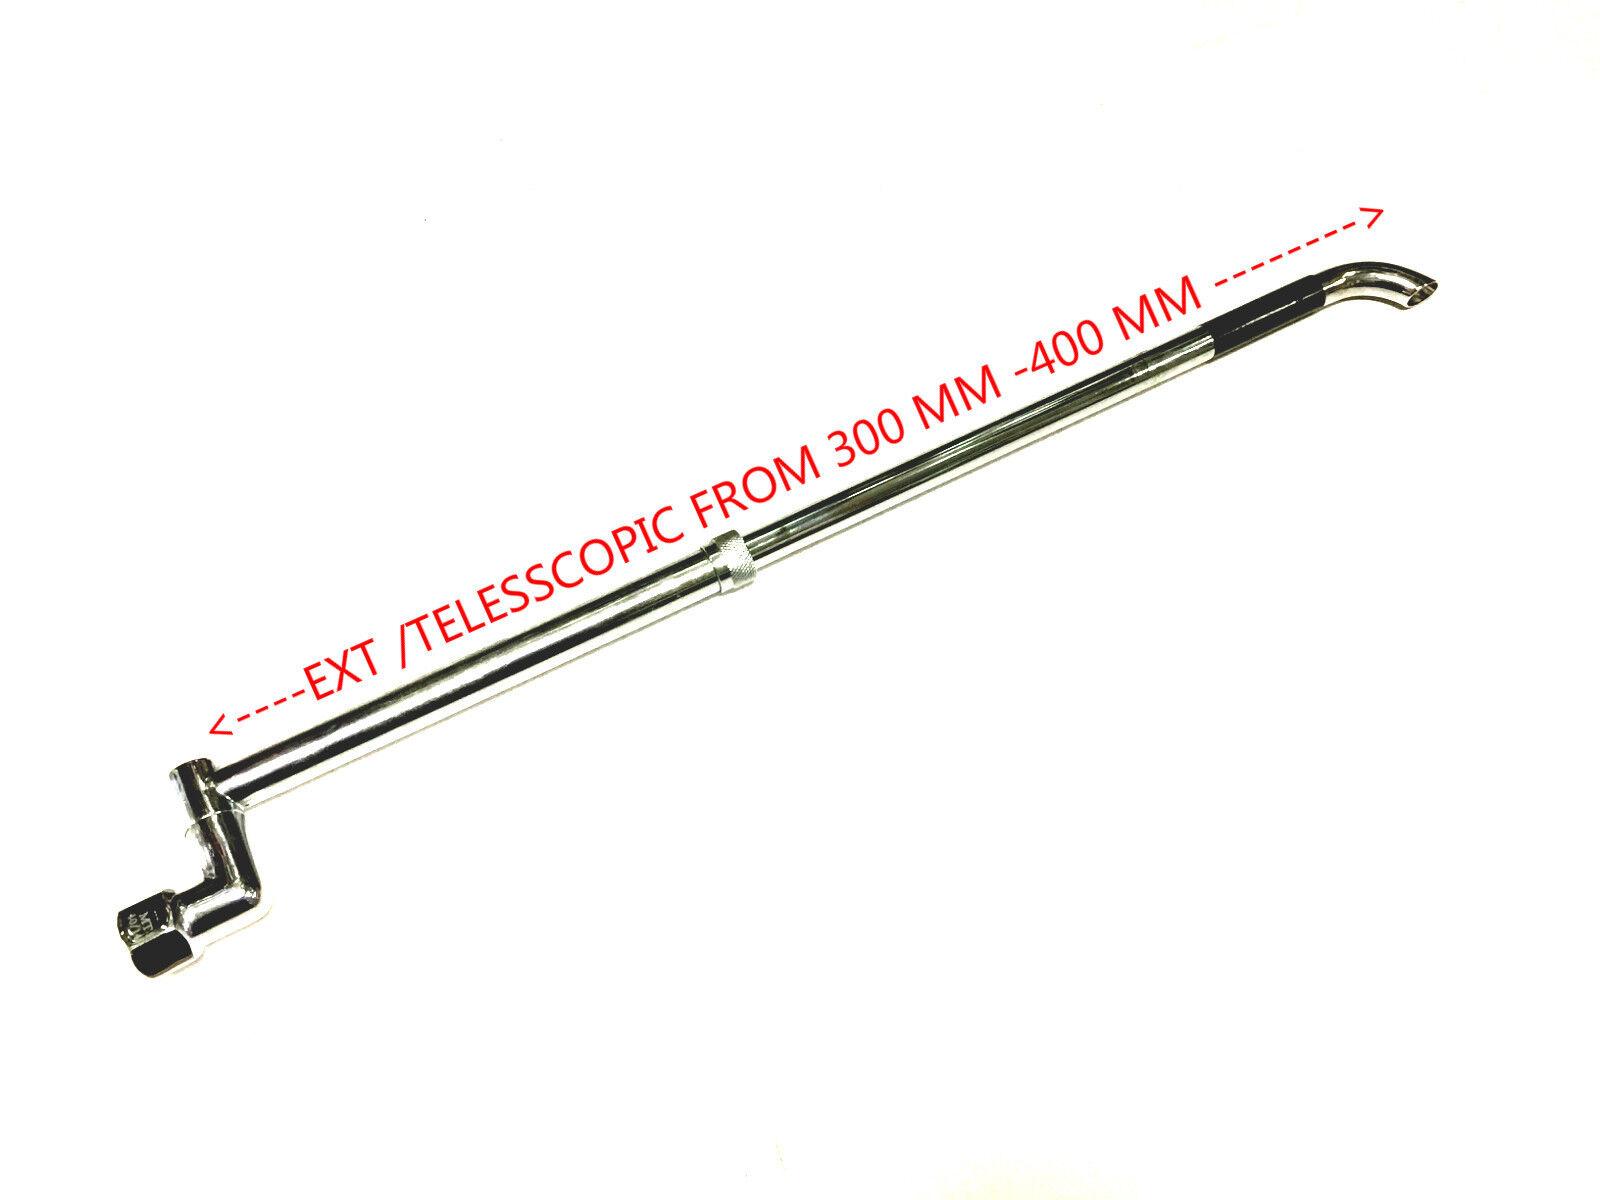 300 MM EXT TO 450 mm LAUNDRY ARM TELESCOPIC CHROME POLISH